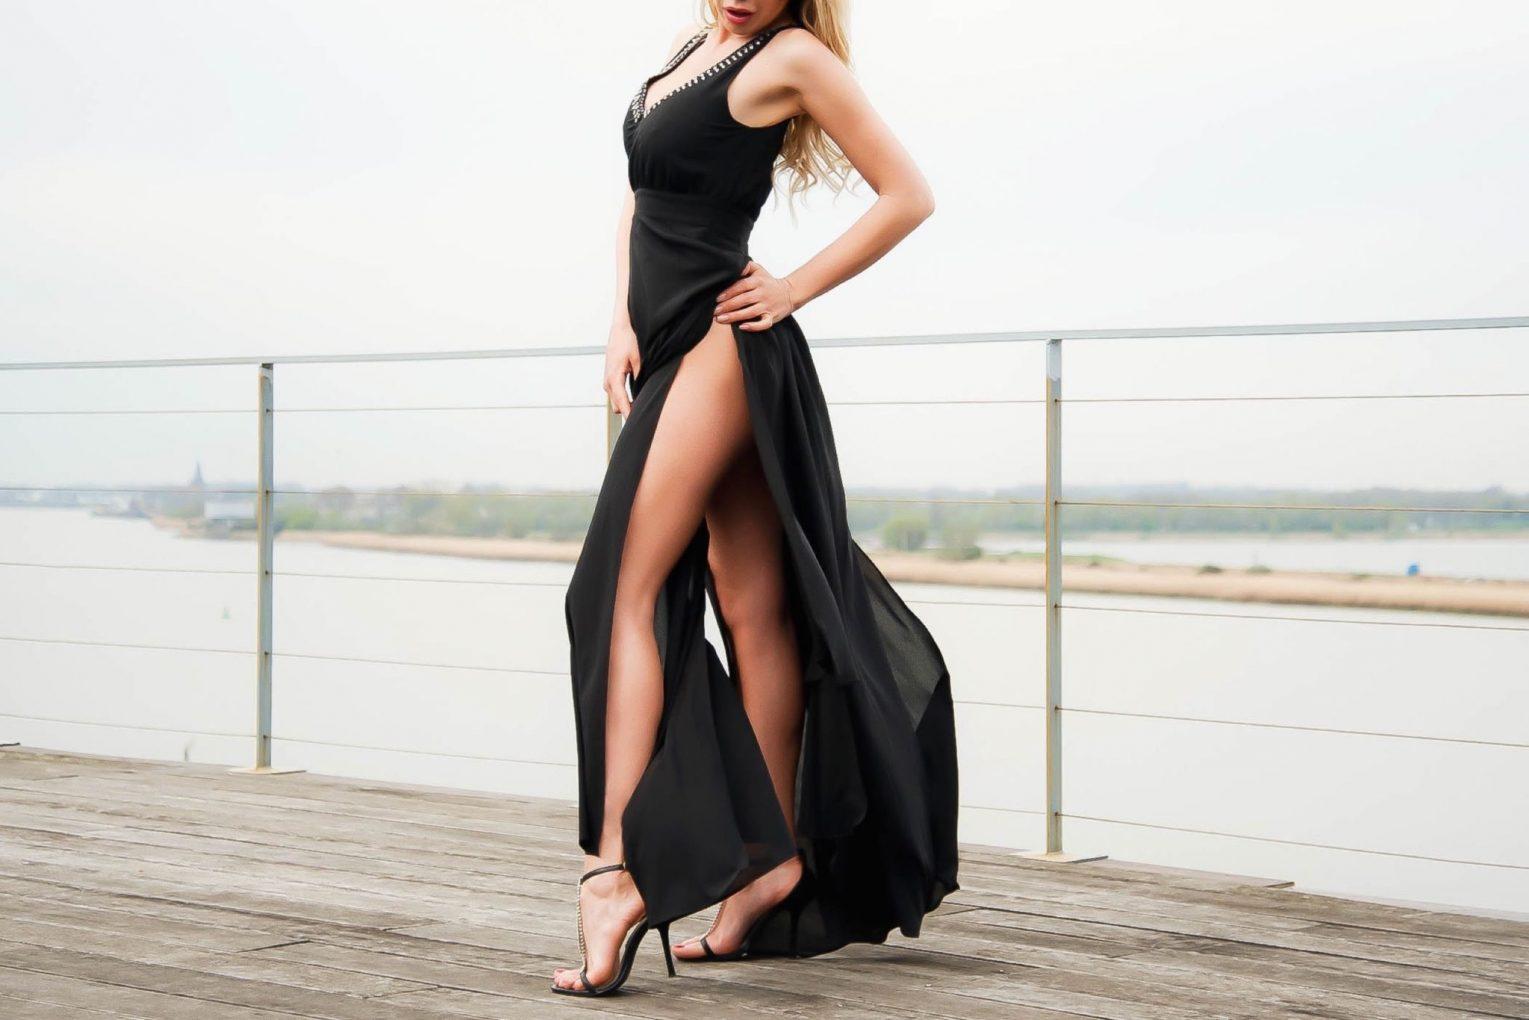 vip escort milan